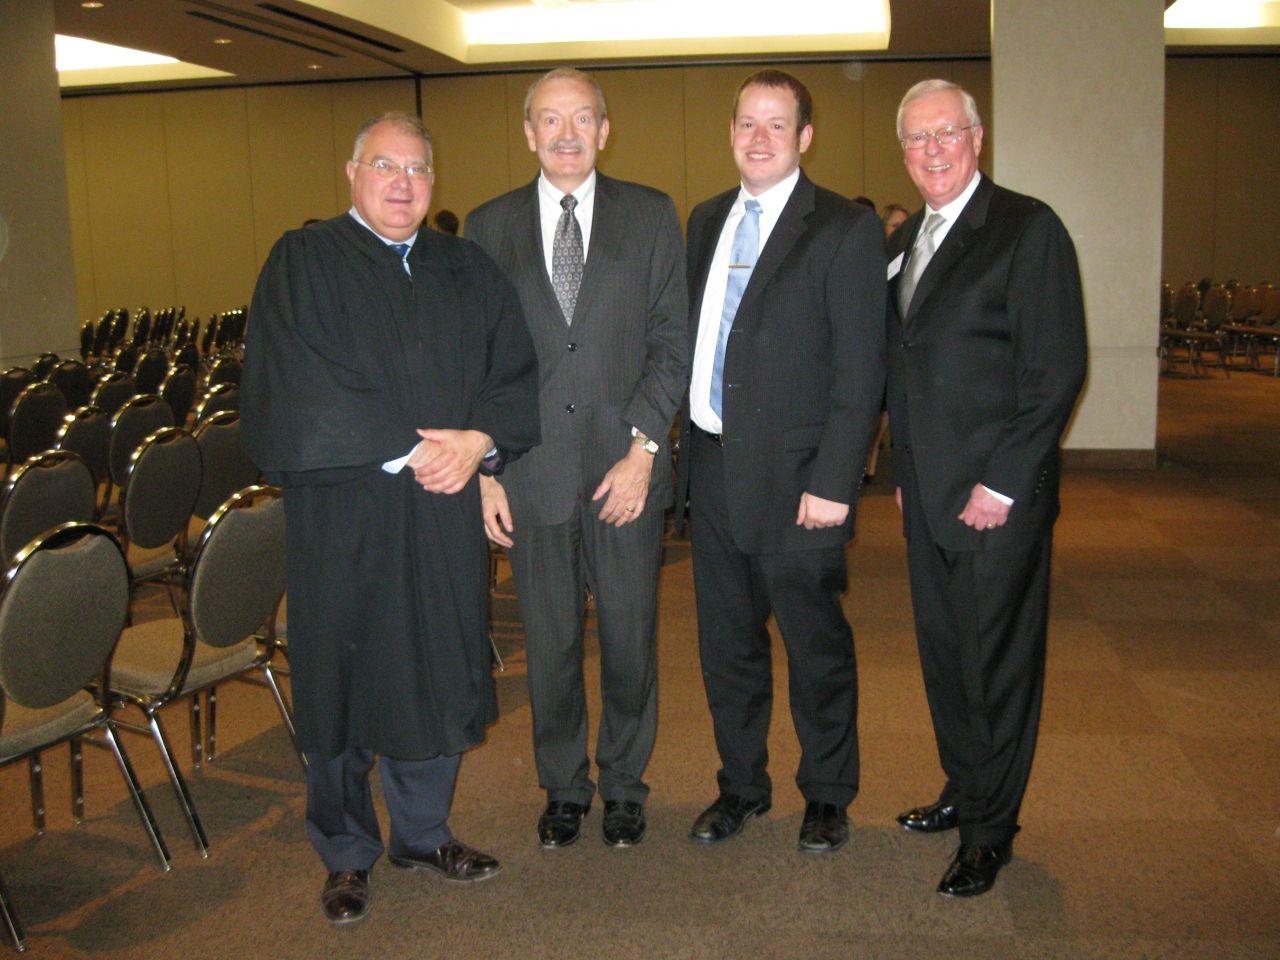 Justice Robert L. Carter, ISBA member Mark McGrath, his son, new admittee Patrick McGrath and ISBA President John O'Brien